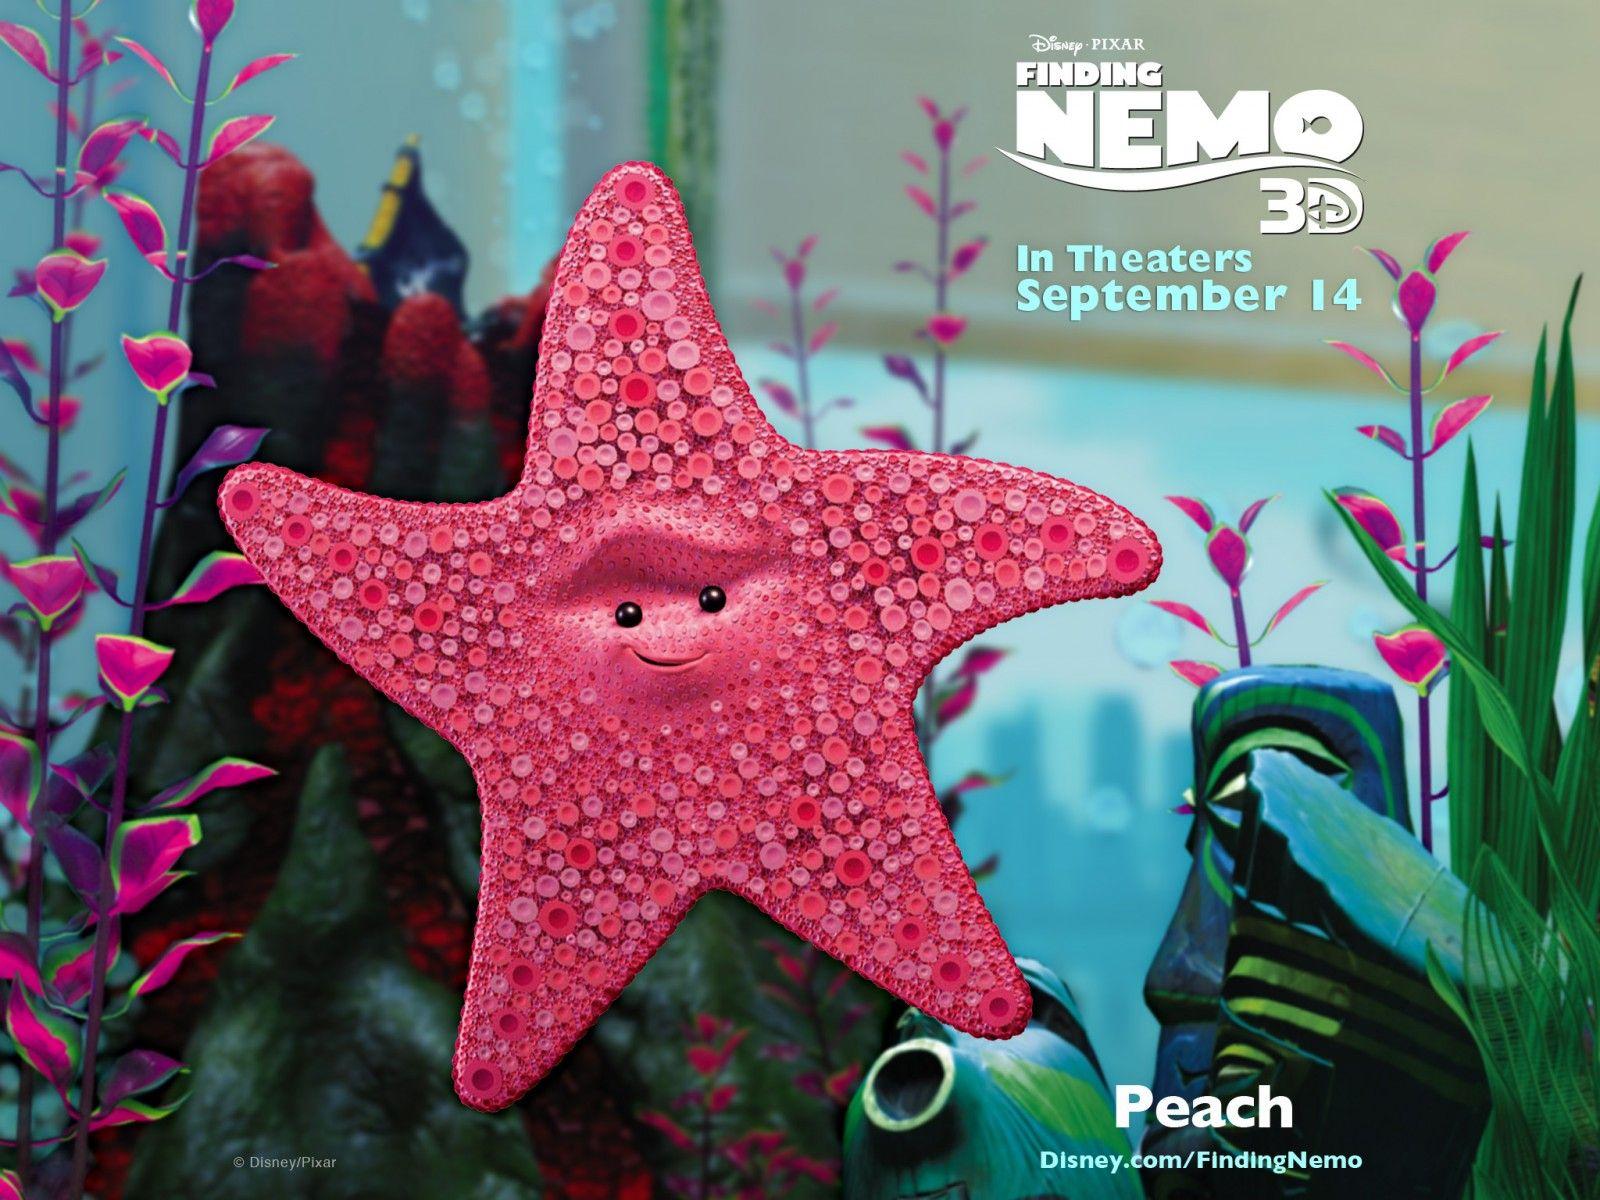 Wallpaper iphone nemo - Free Download Finding Nemo Peach Wallpaper Pageresource Com